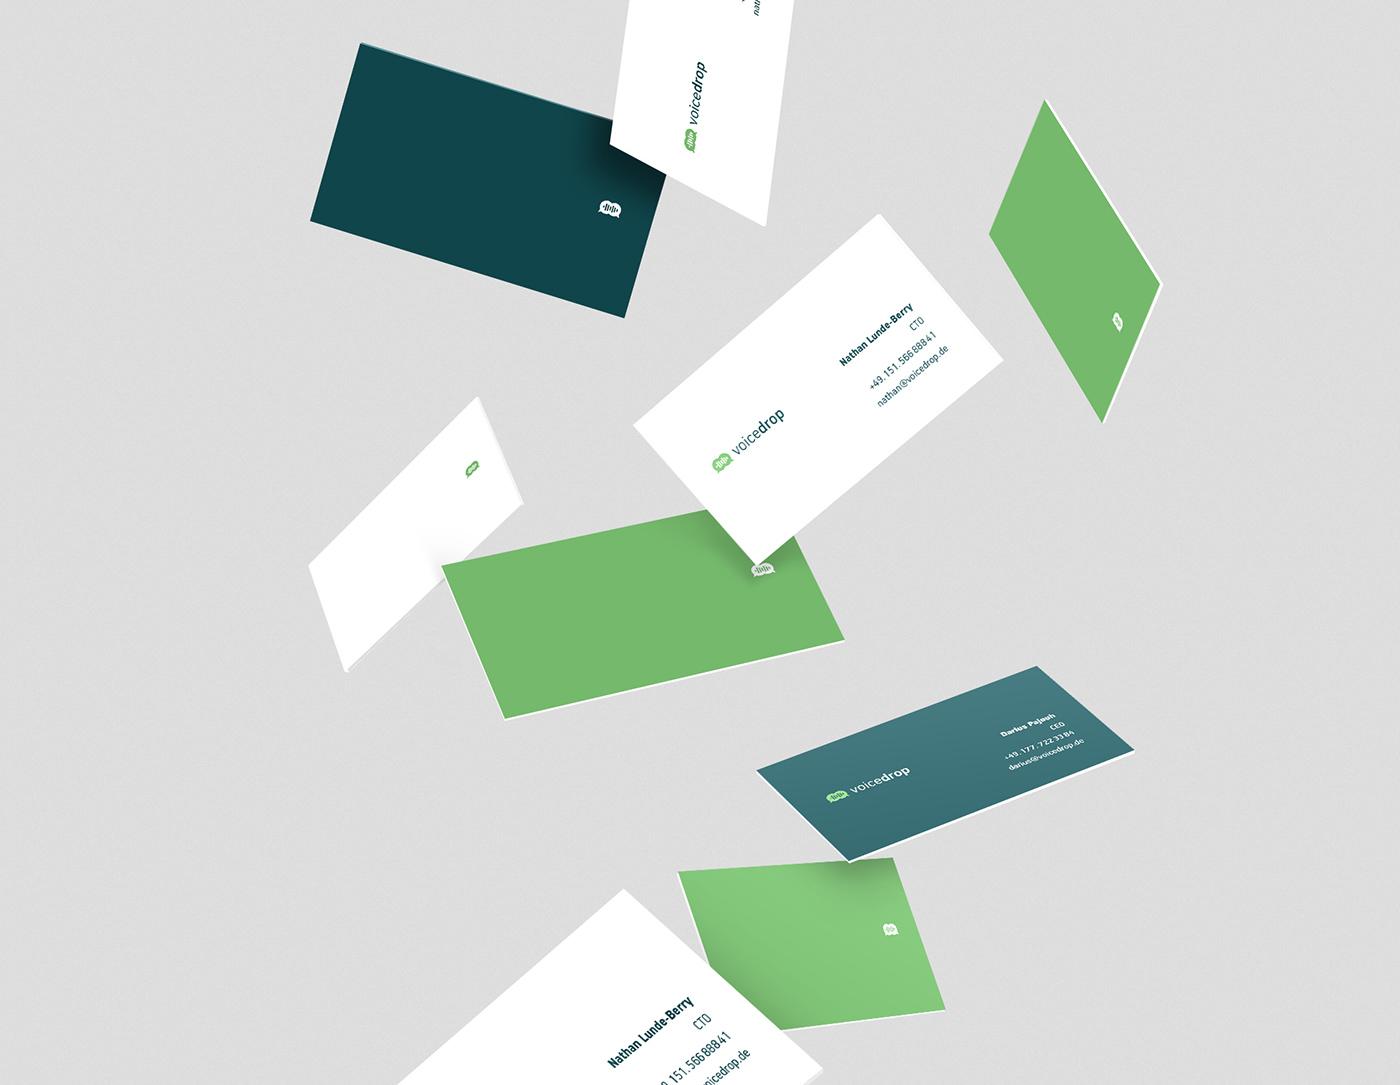 voicedrop brand design by upstruct